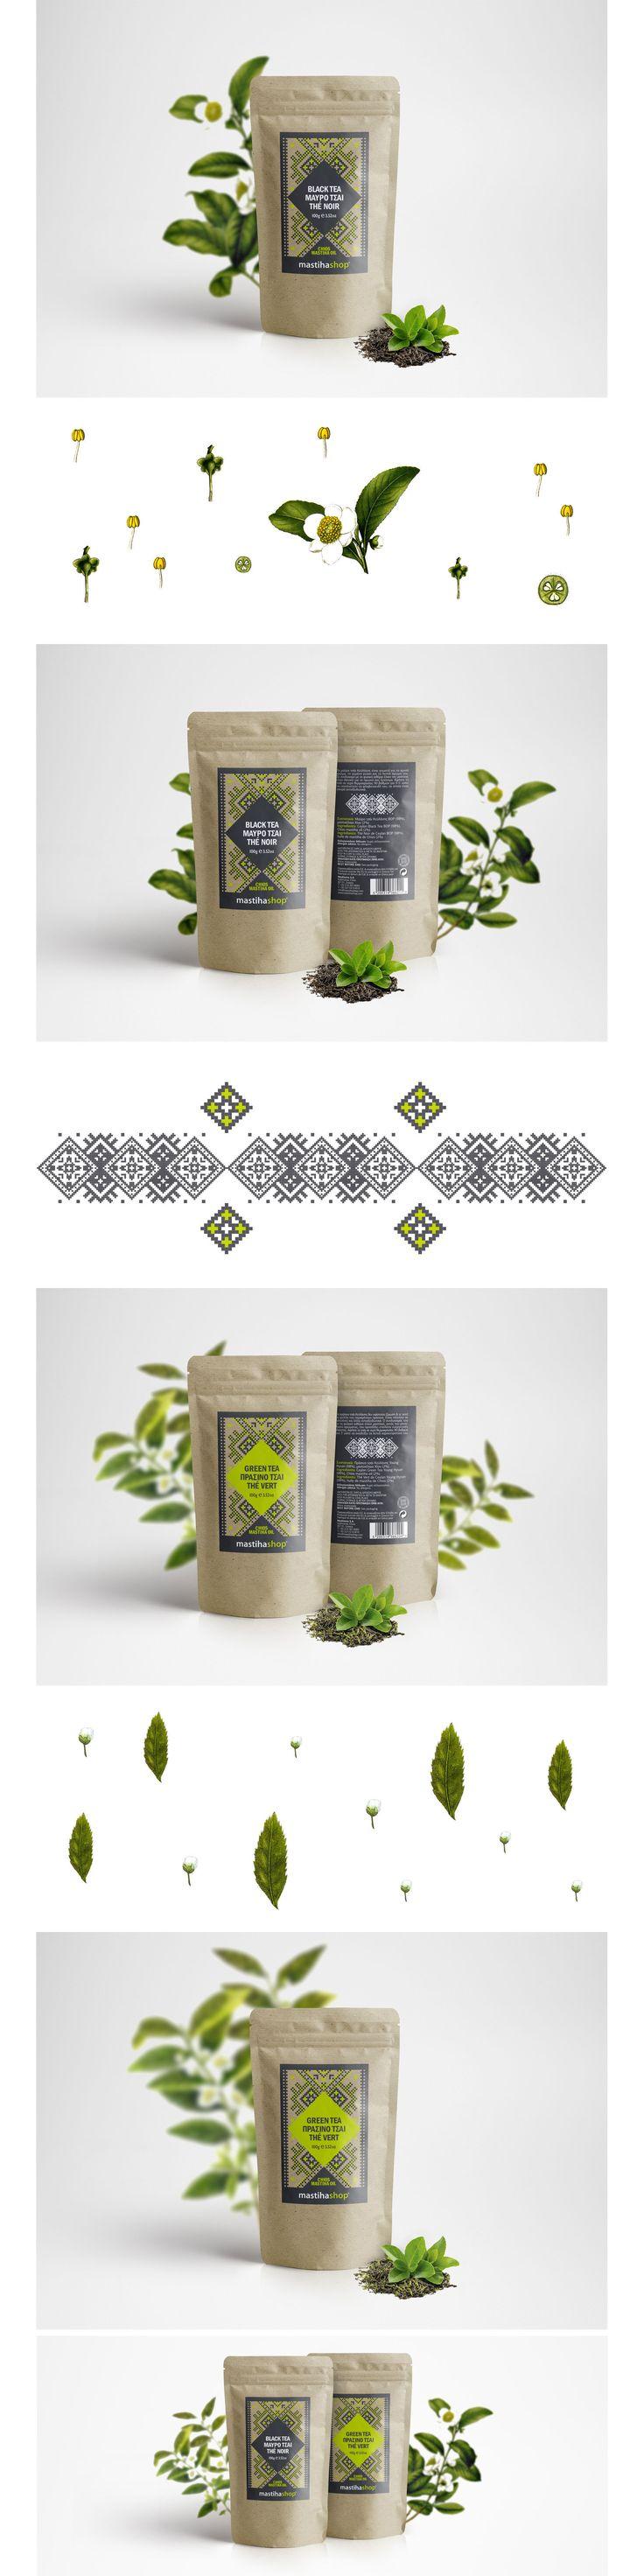 "Check out my @Behance project: ""mastihashop | Ceylon Black & Green tea | packaging"" https://www.behance.net/gallery/47348519/mastihashop-Ceylon-Black-Green-tea-packaging"